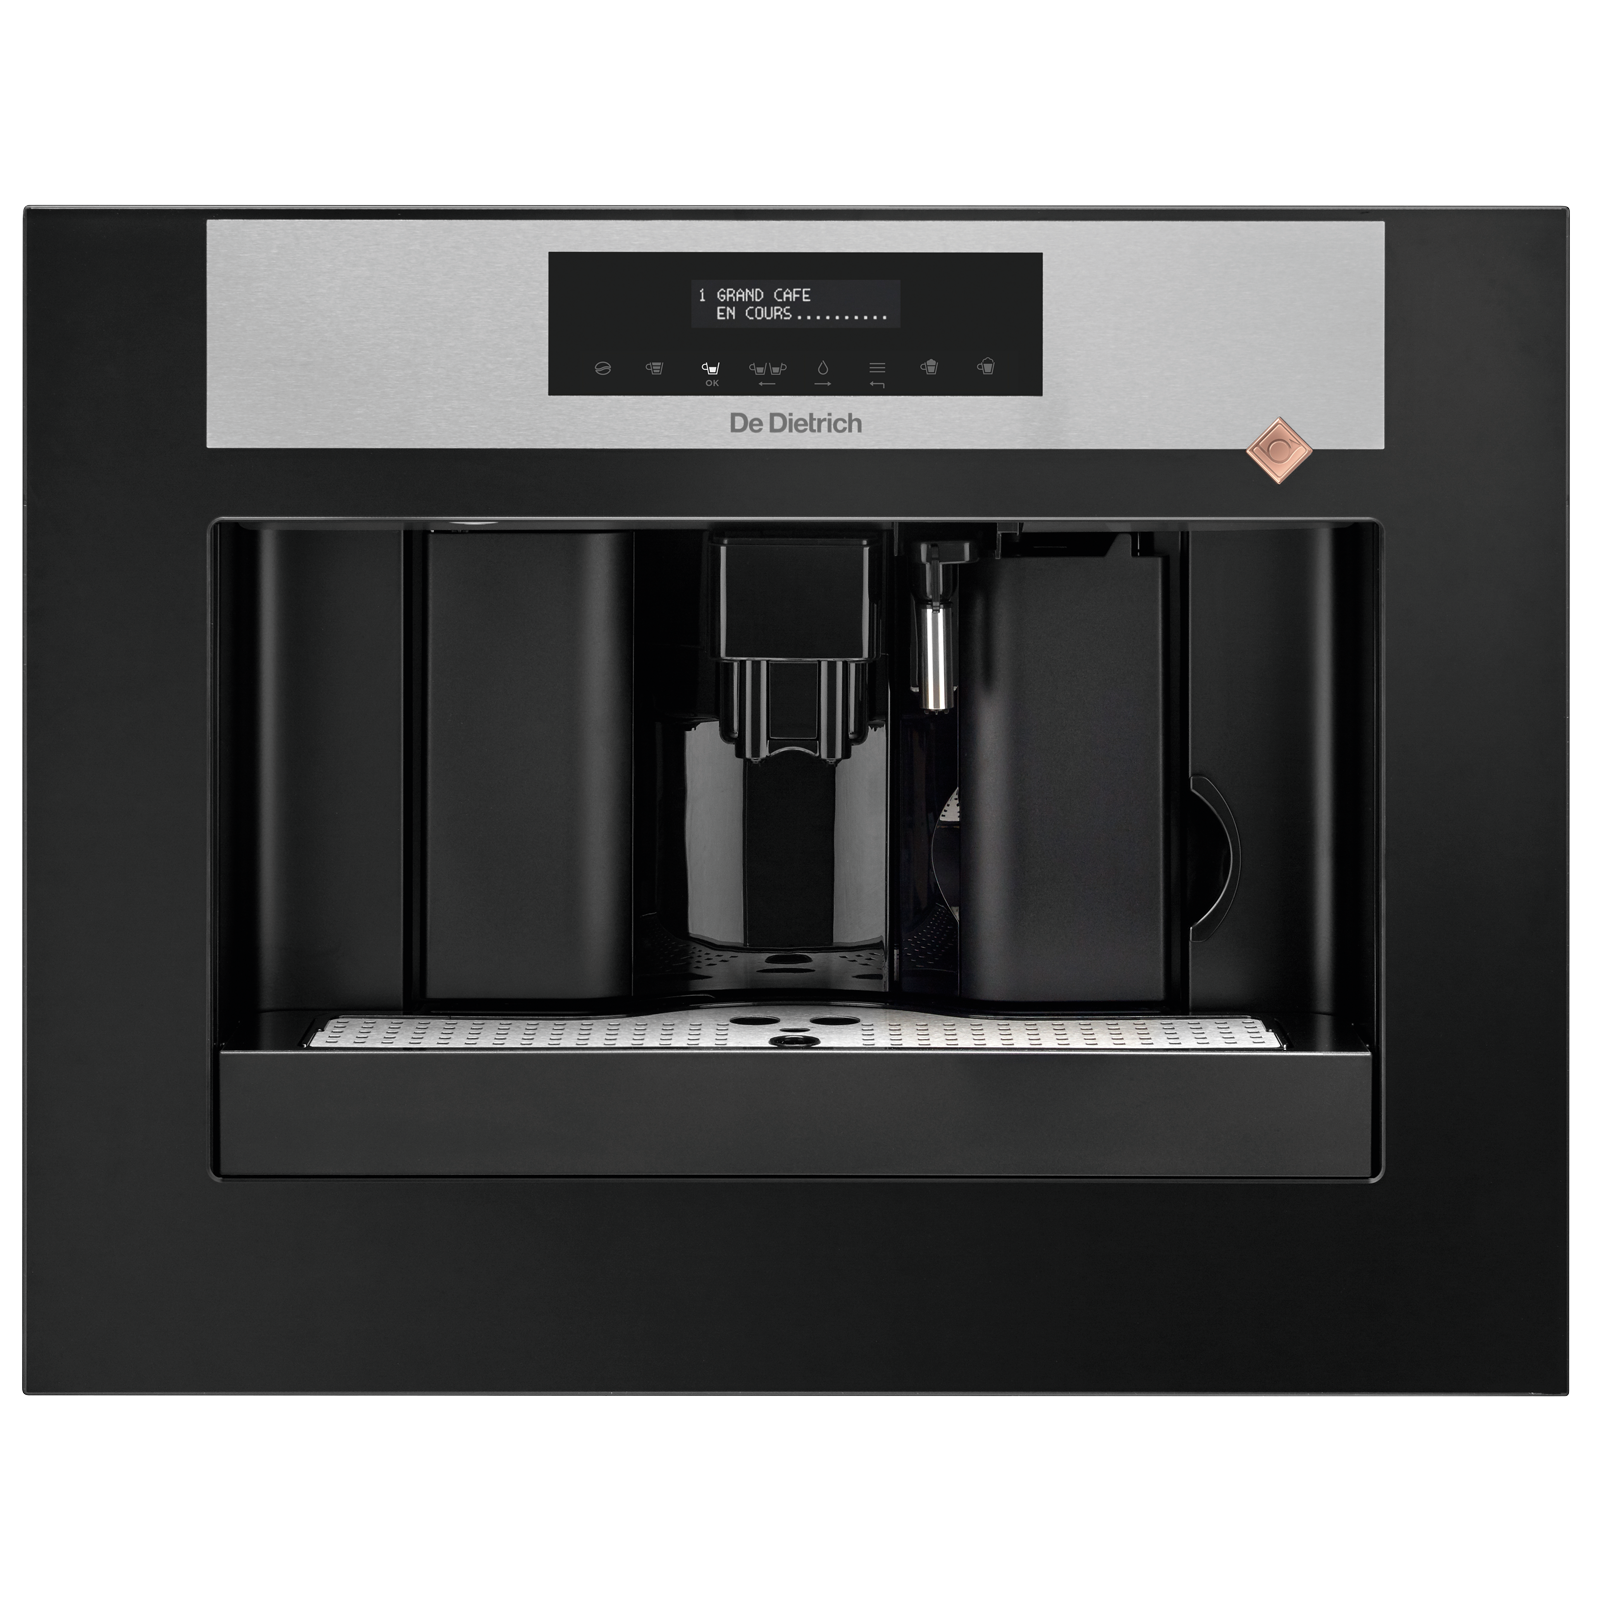 machine caf dkd7400x de dietrich. Black Bedroom Furniture Sets. Home Design Ideas